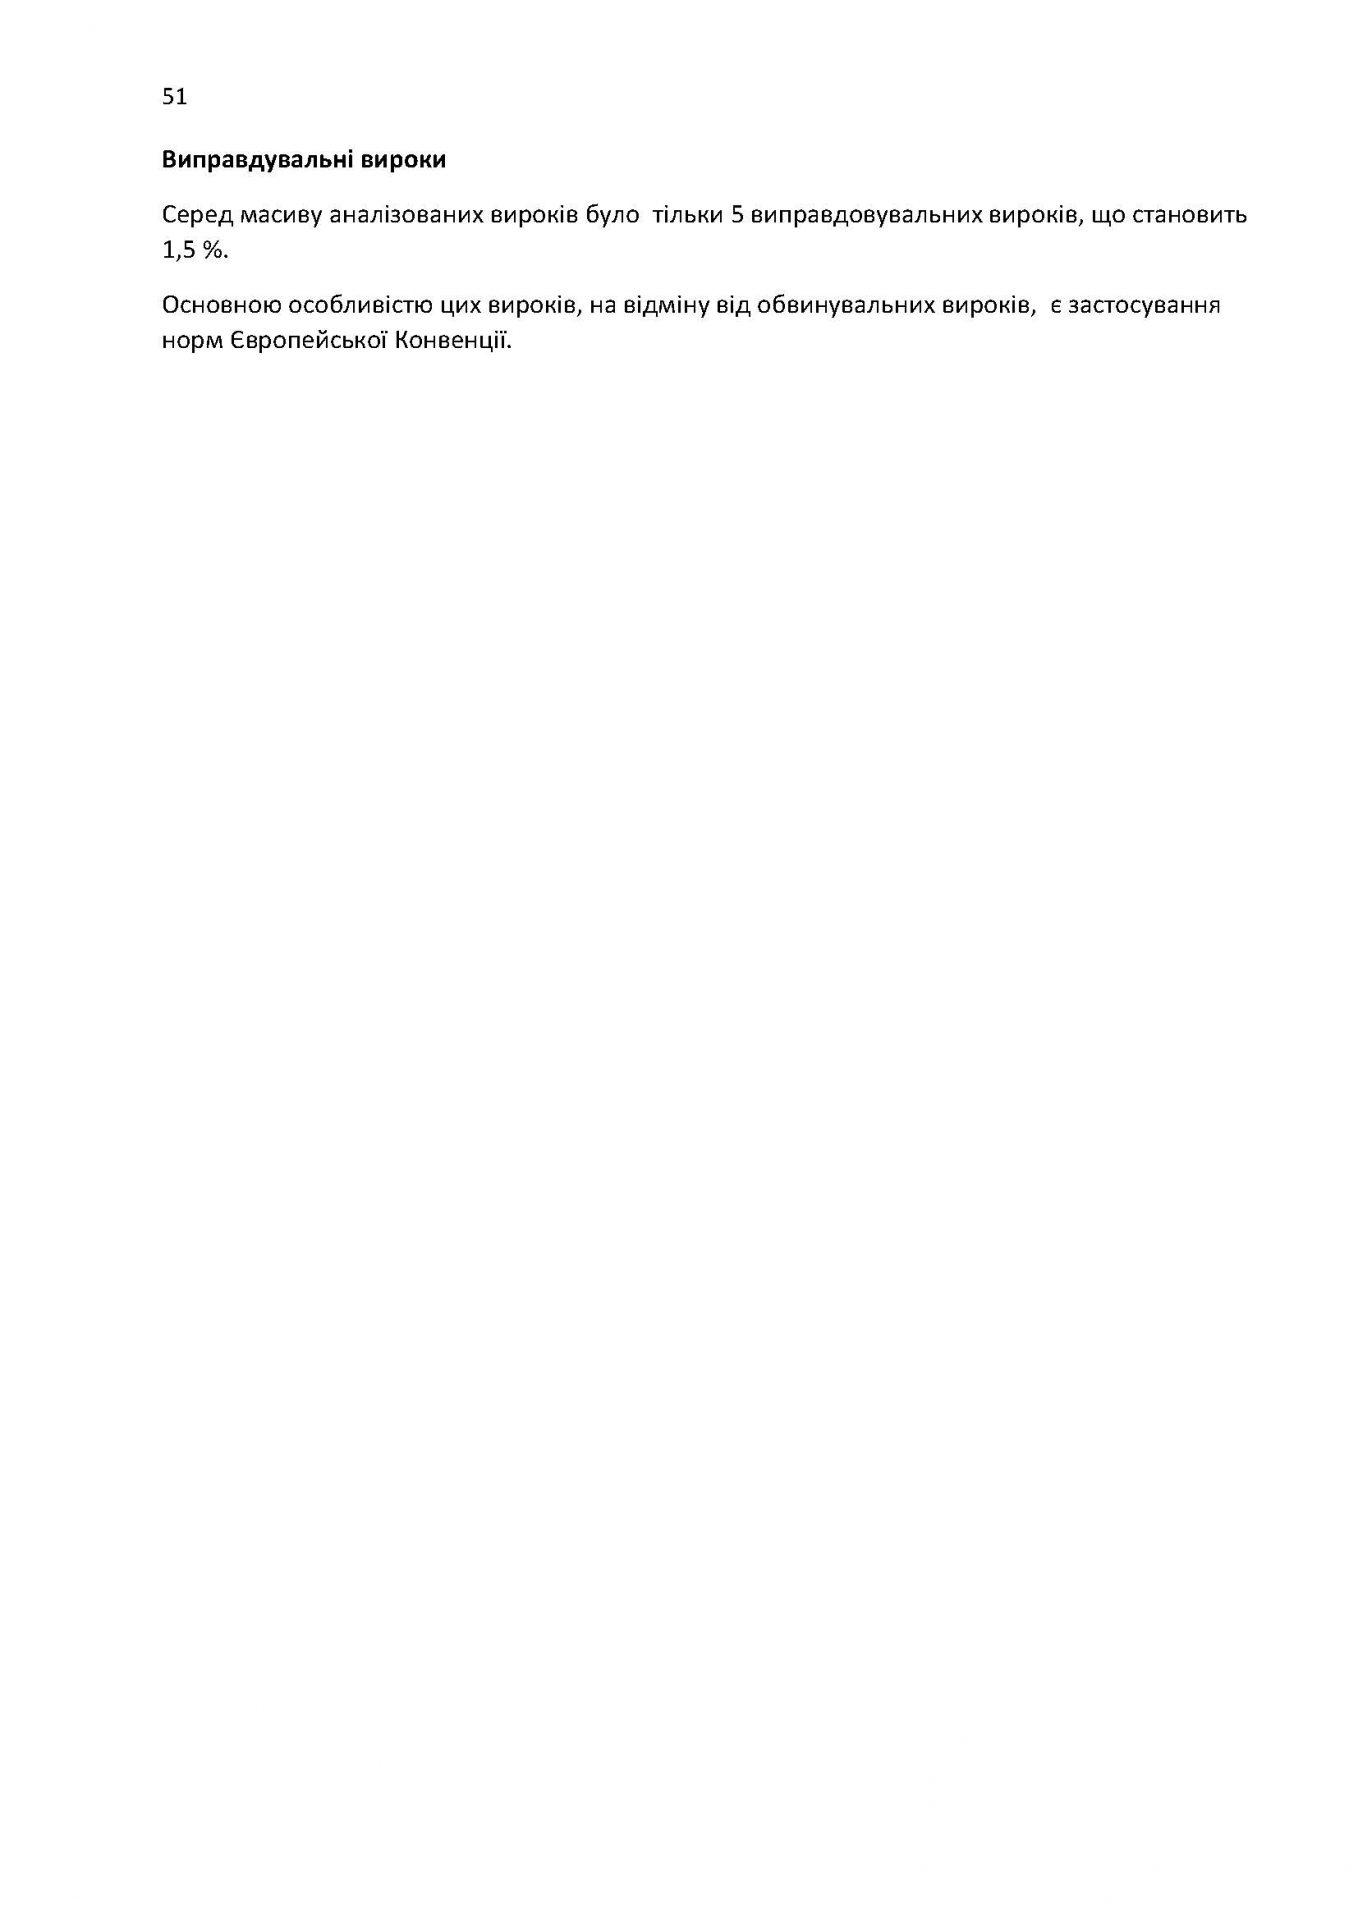 Draft Report monitoring print USAID_Страница_51